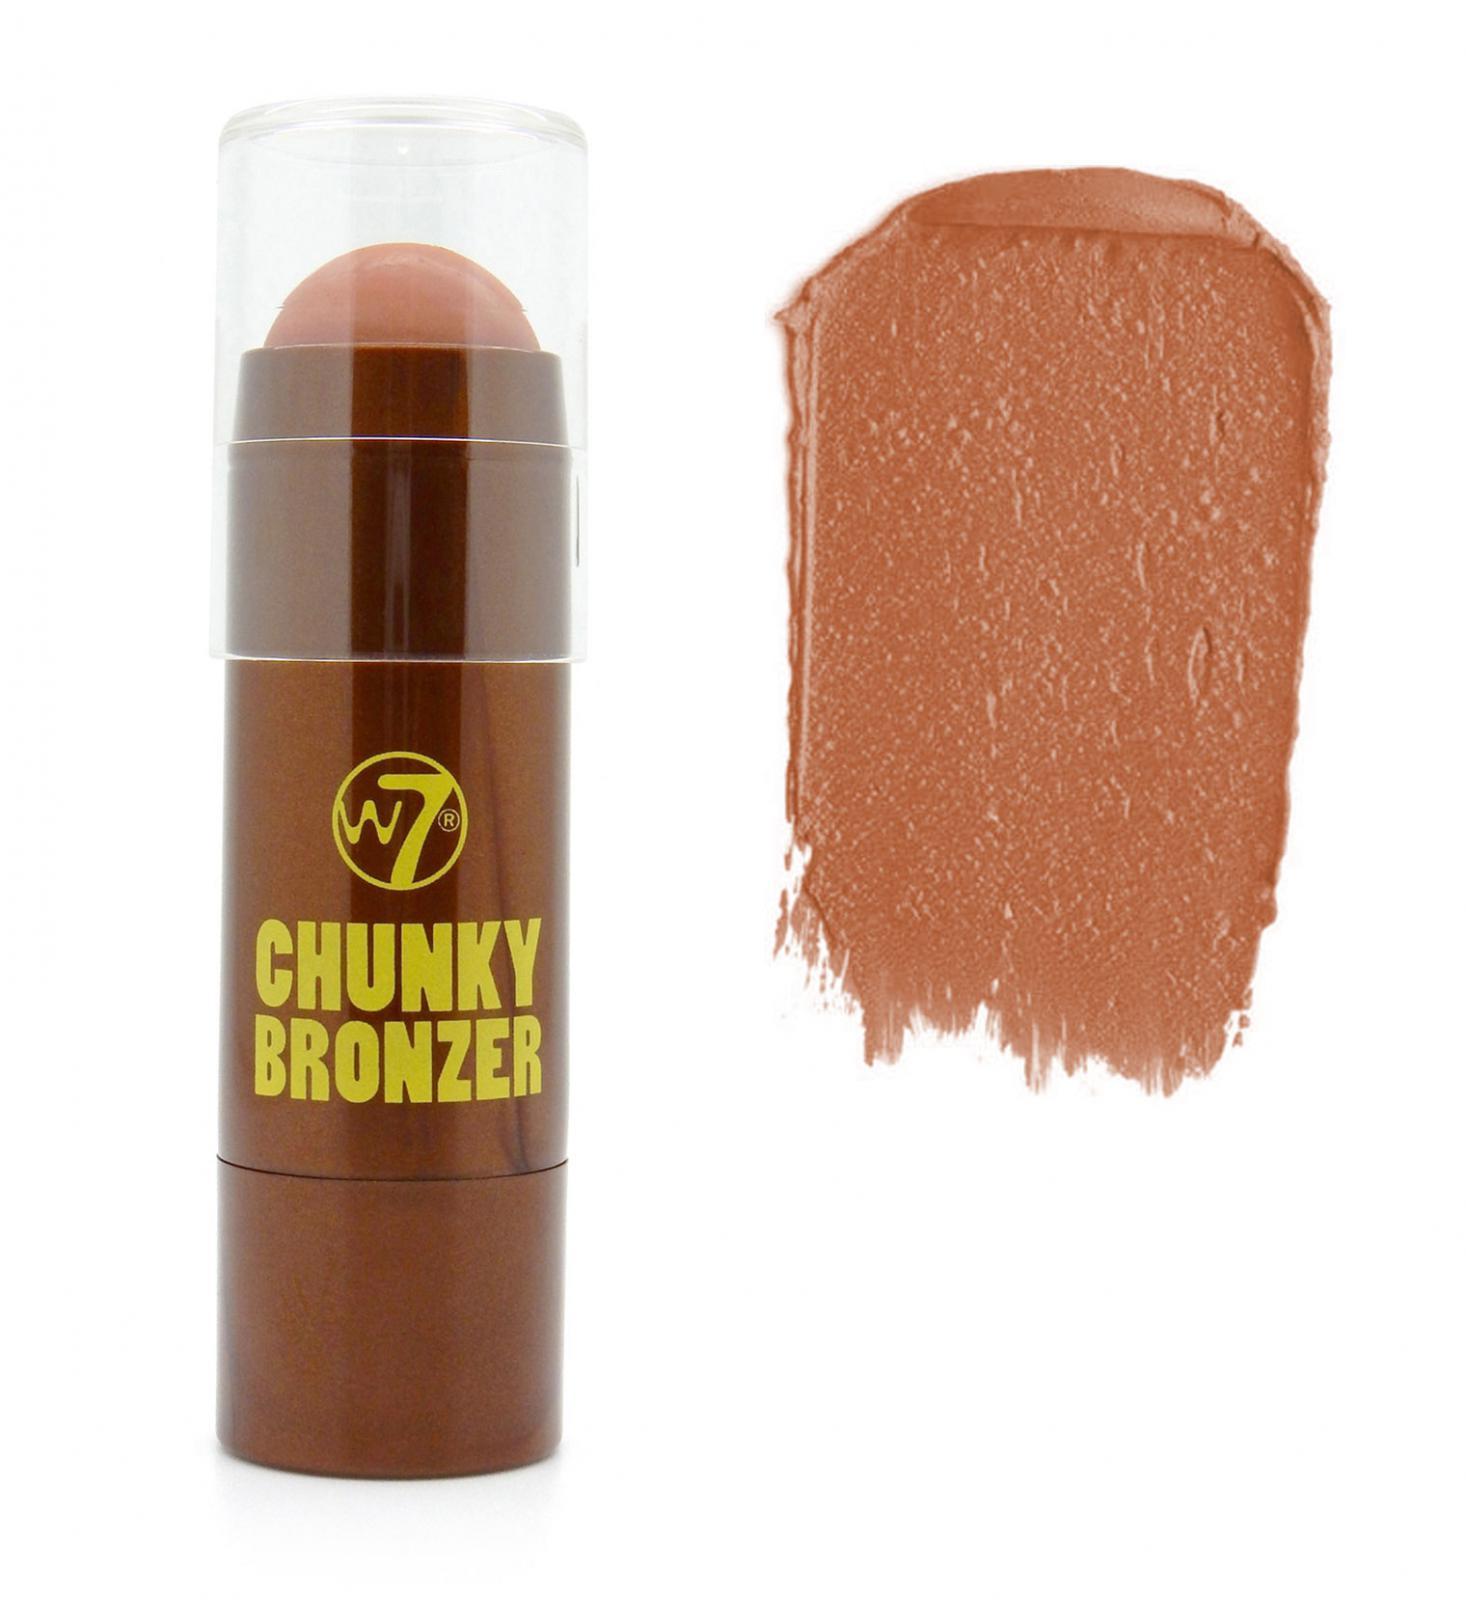 Baton Pentru Conturarea Fetei W7 Chunky Bronzer - Hawaiian Bronze